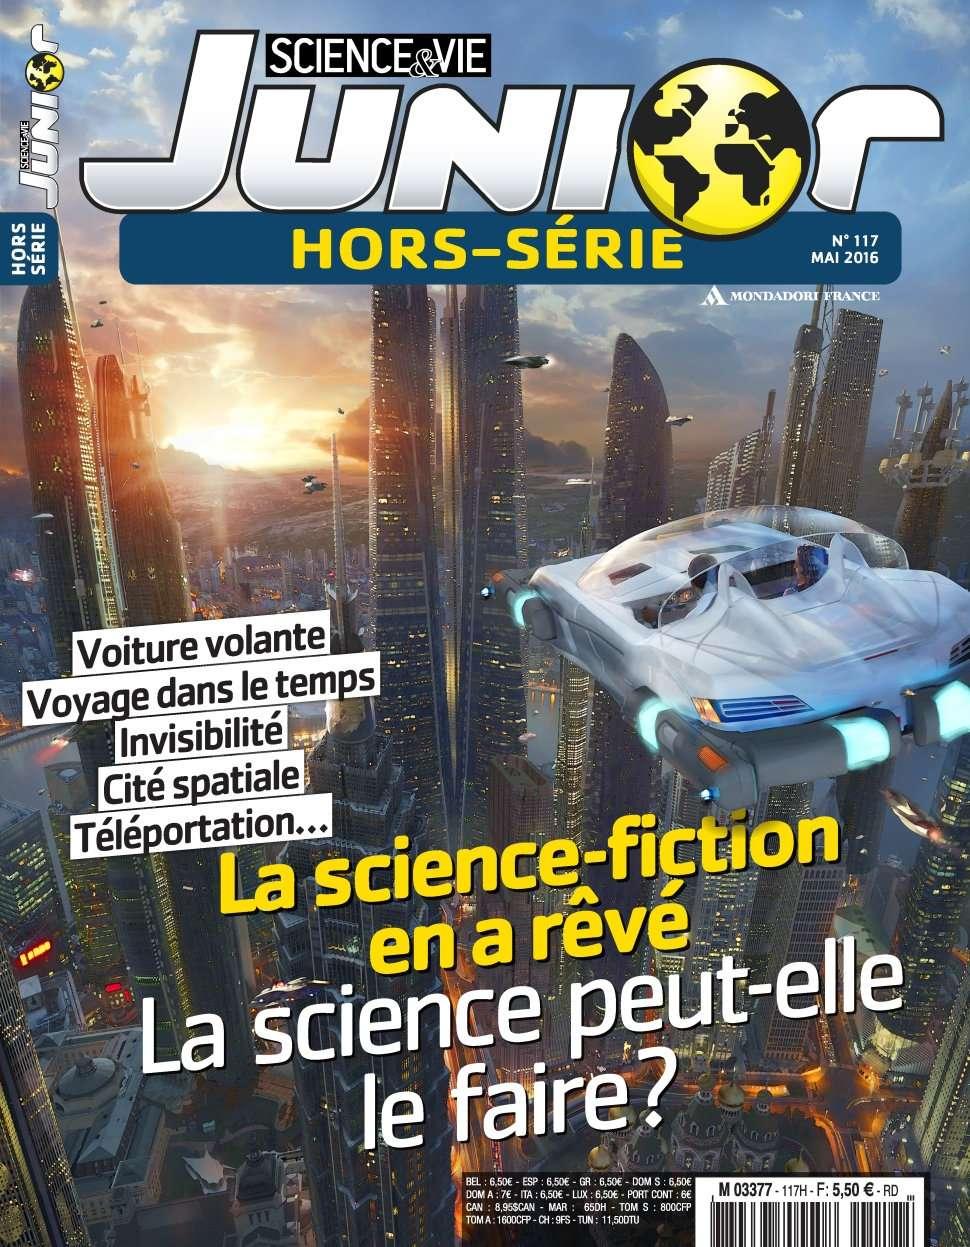 Science & Vie Junior Hors-Série 117 - Mai 2016